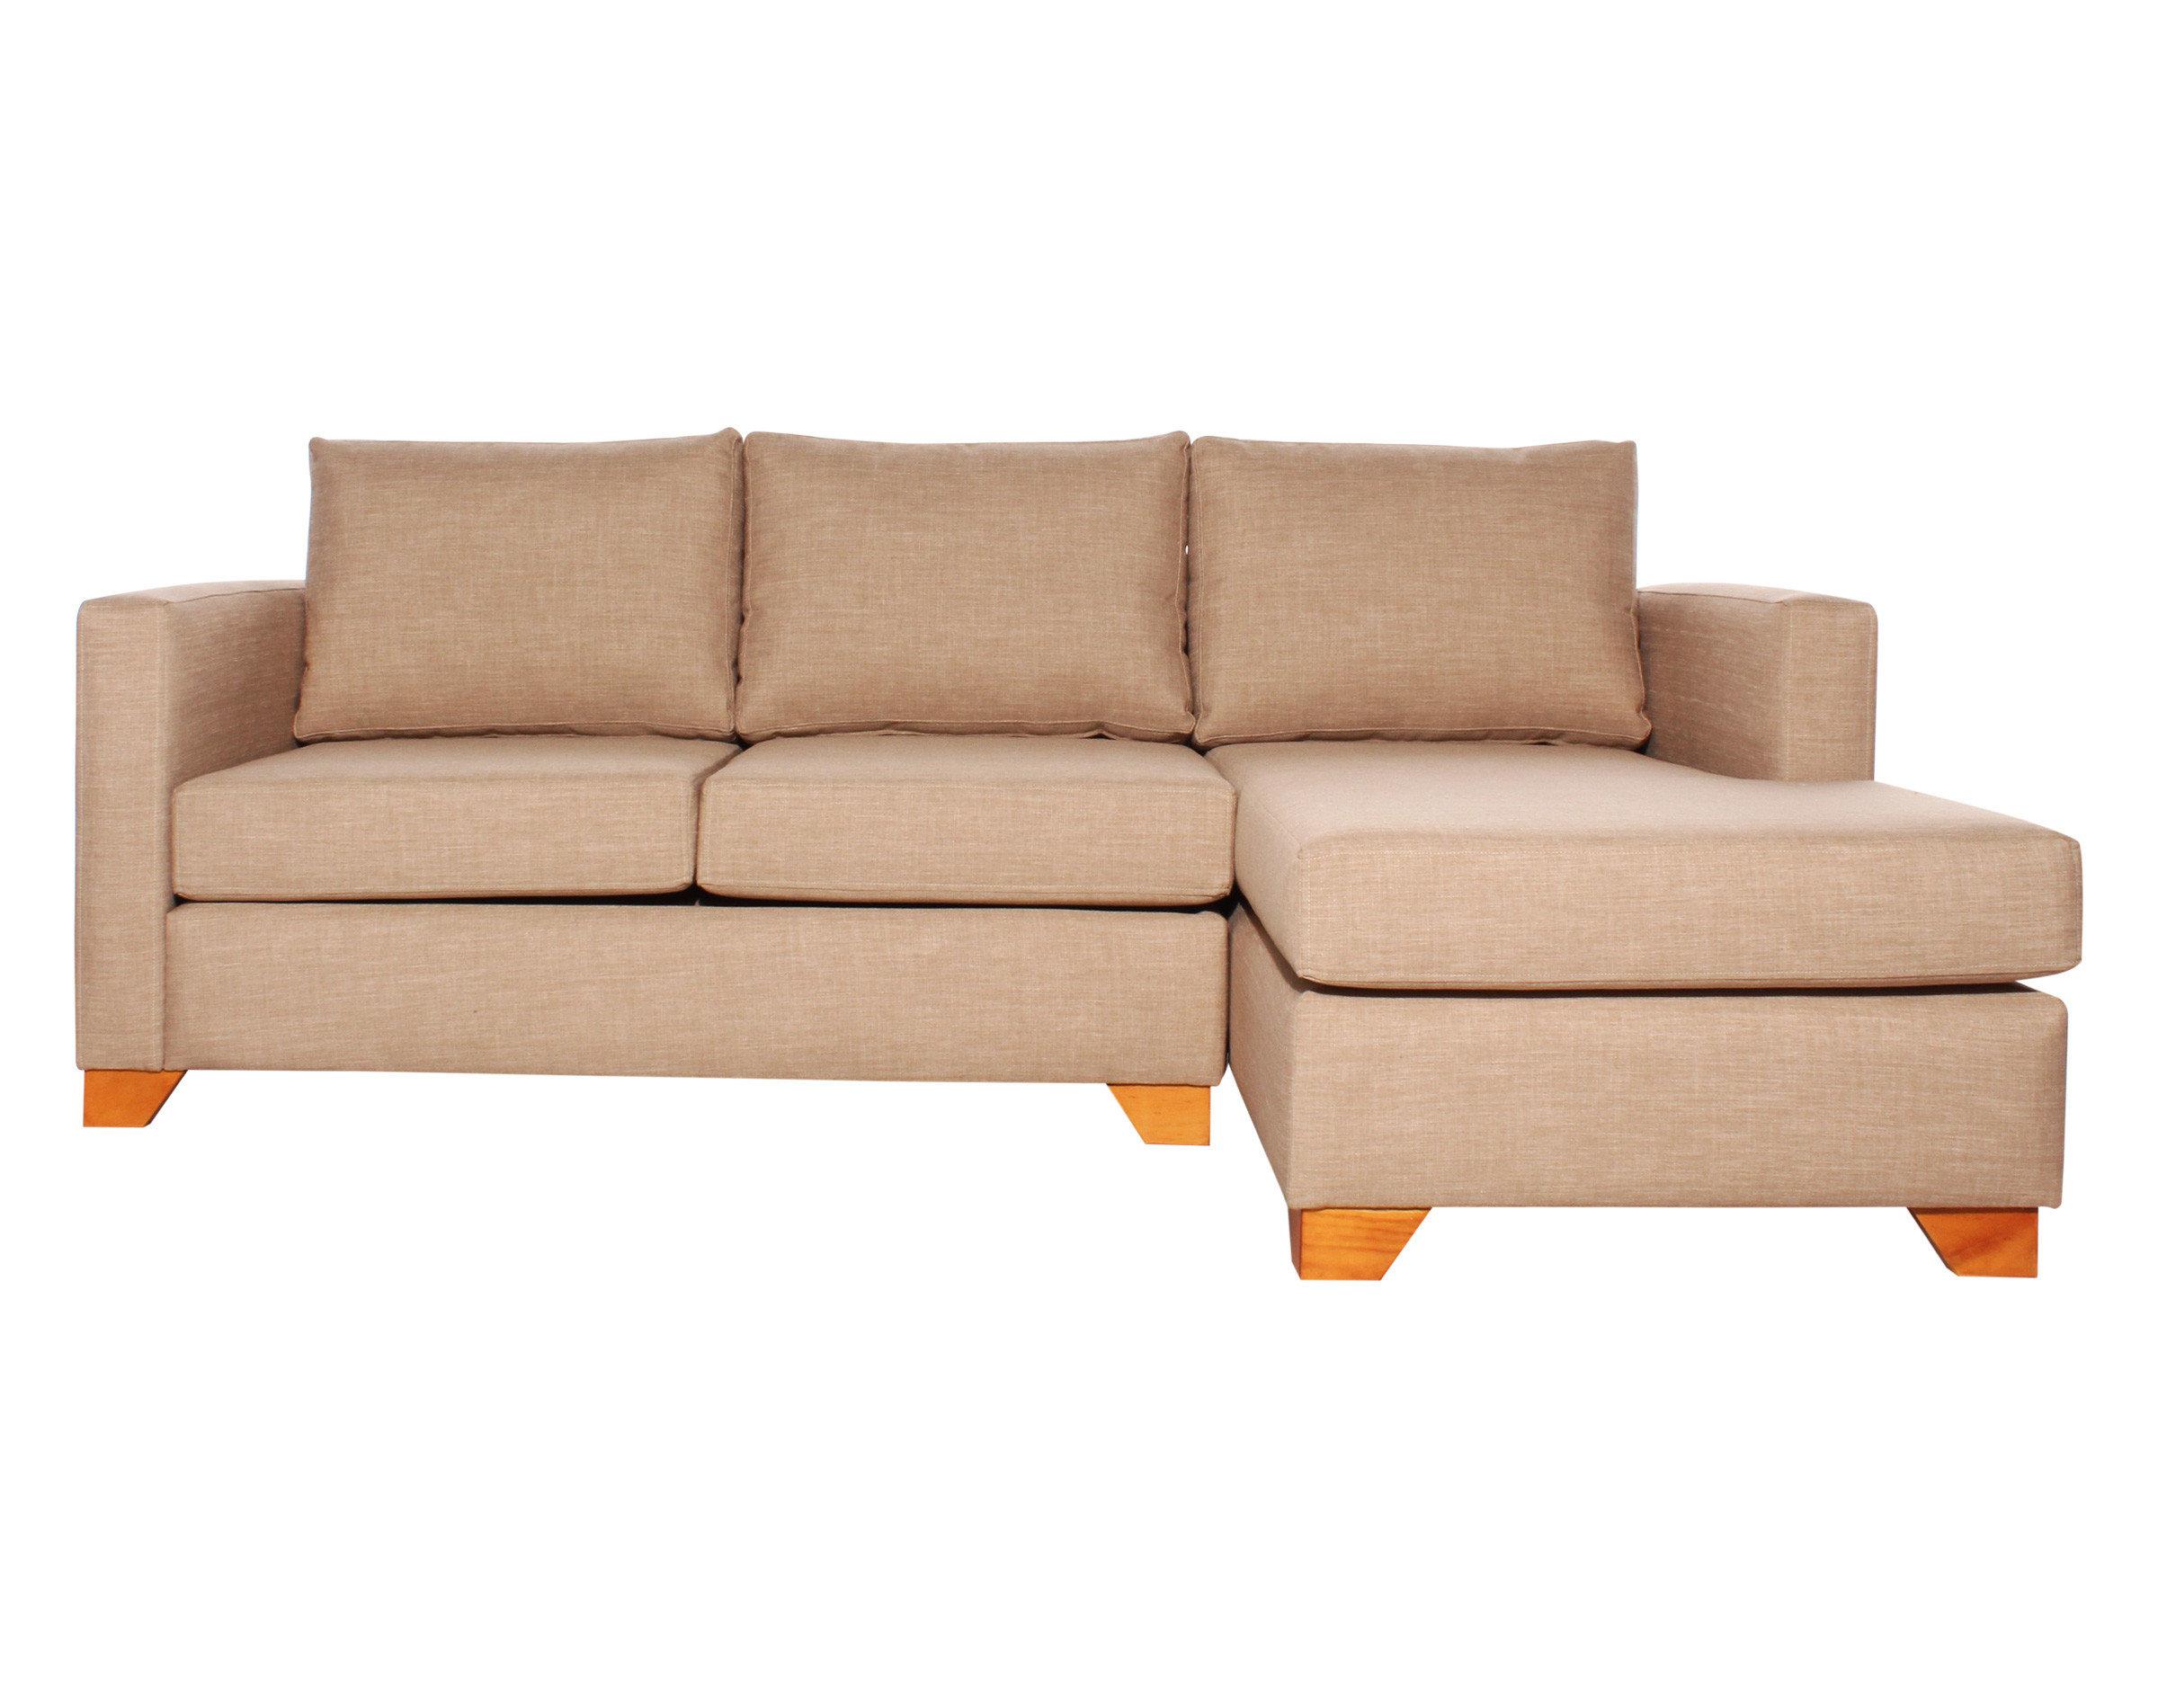 Sofa cama seccional derecho Bariloche 226x150cm